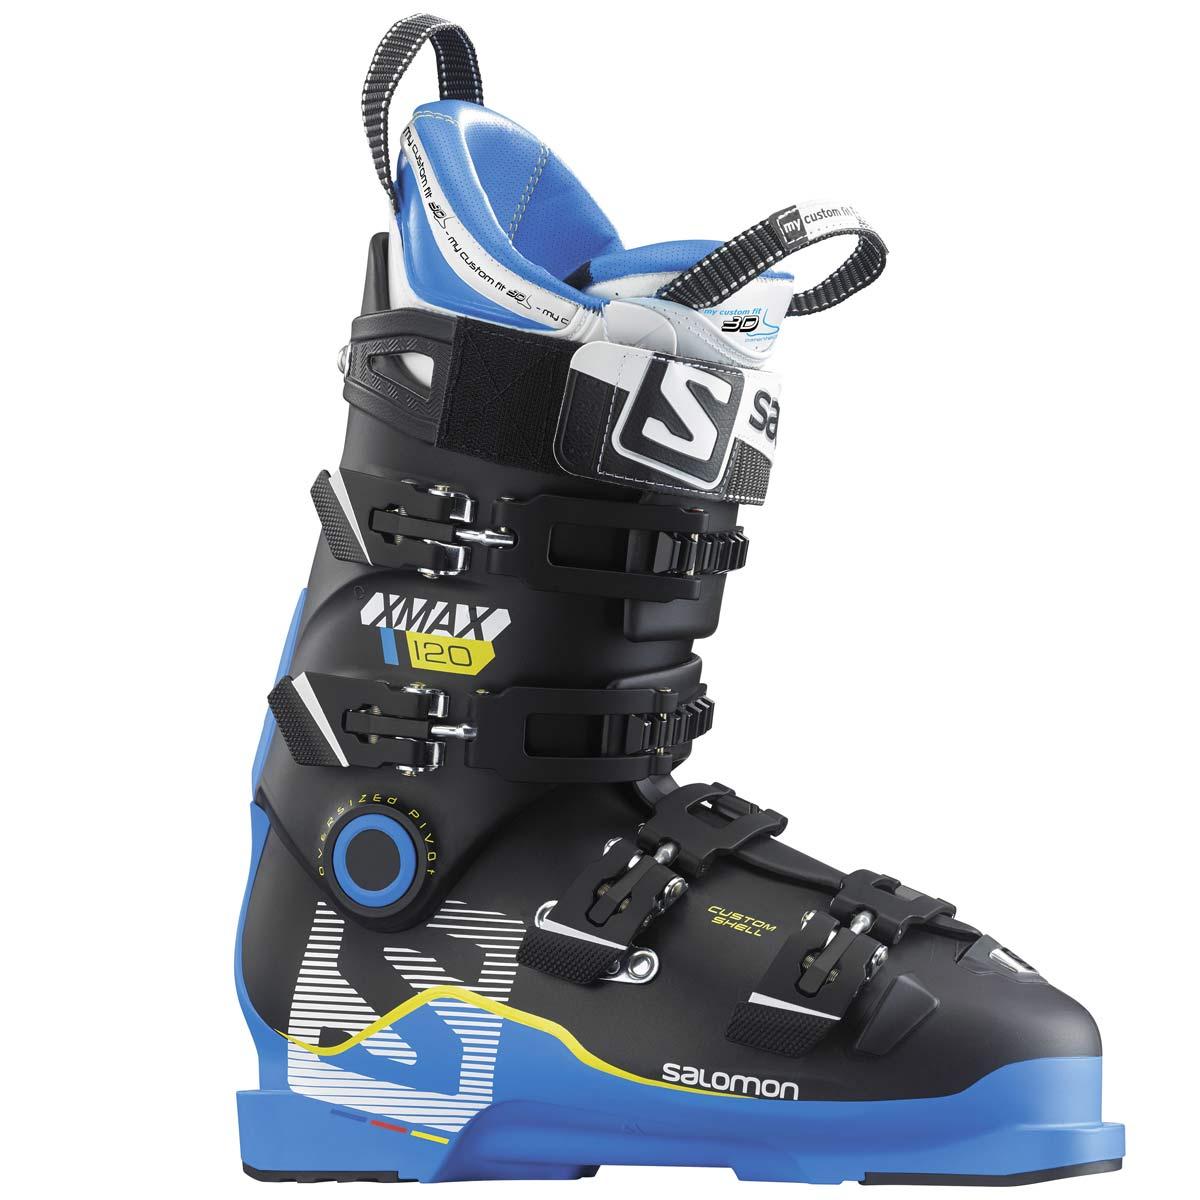 Salomon Men's X Max 120 Ski Boots On Sale